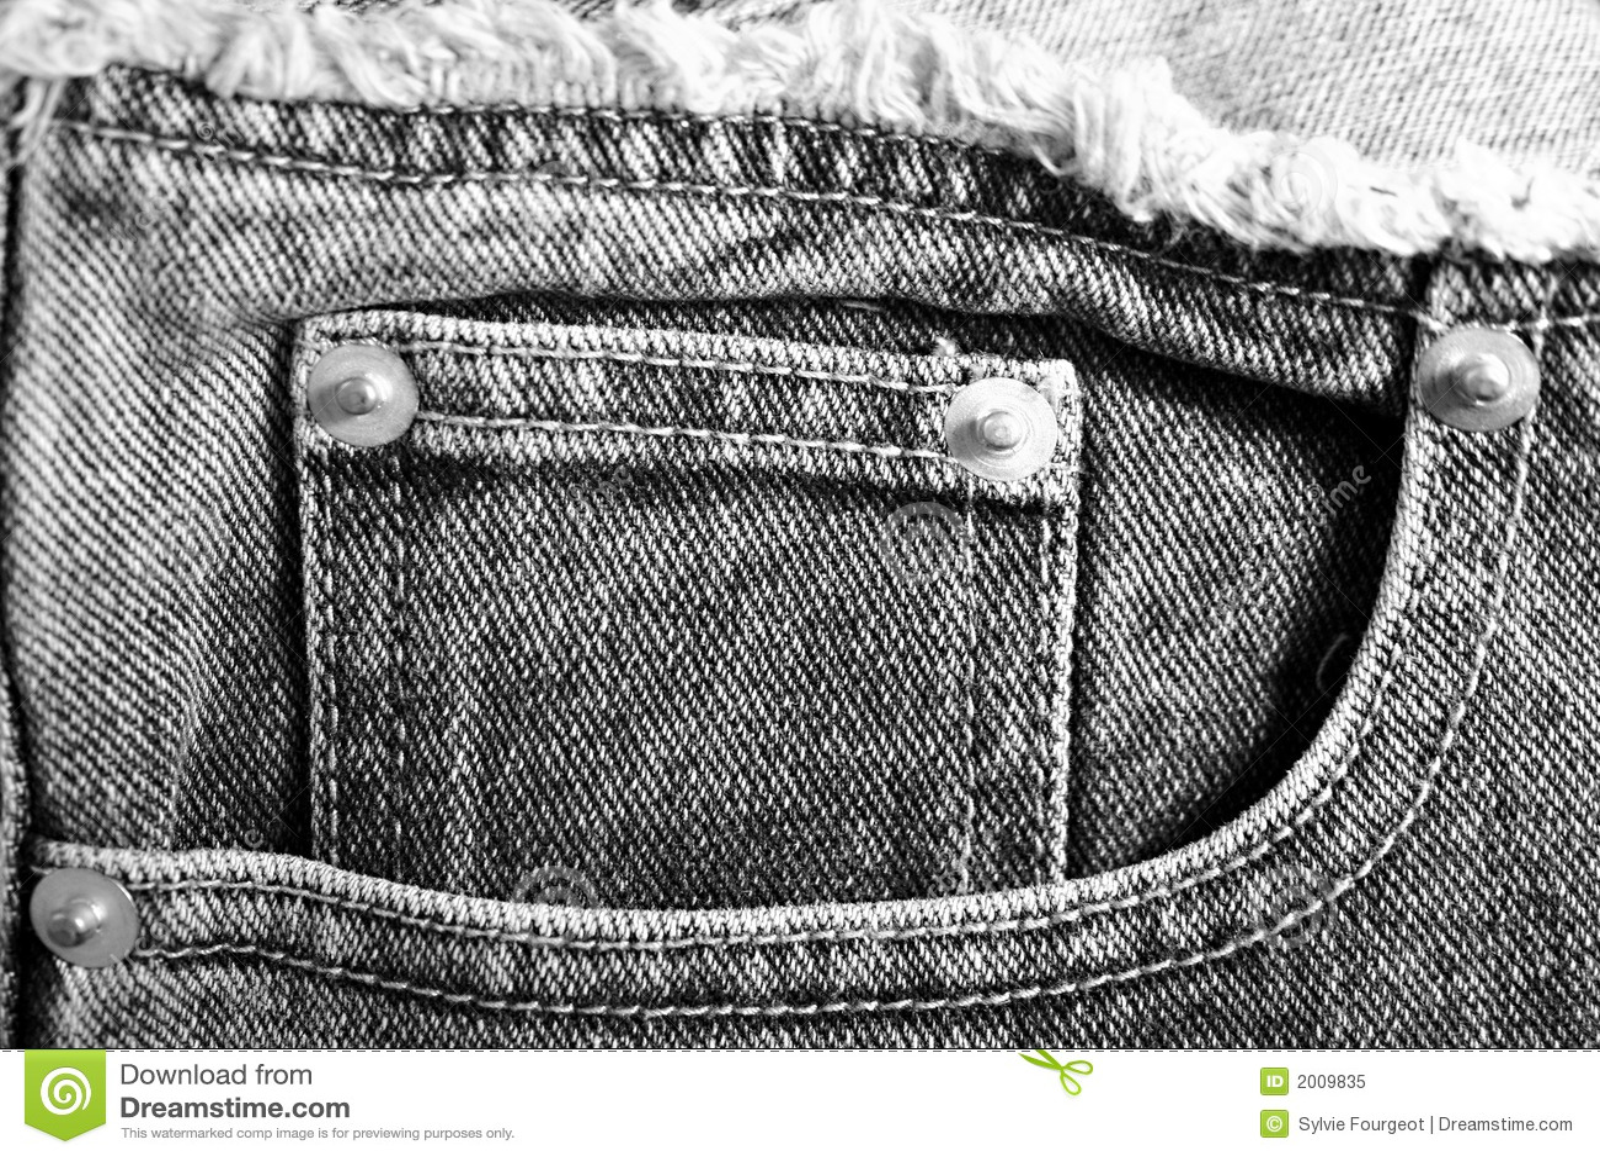 Jean pockets s